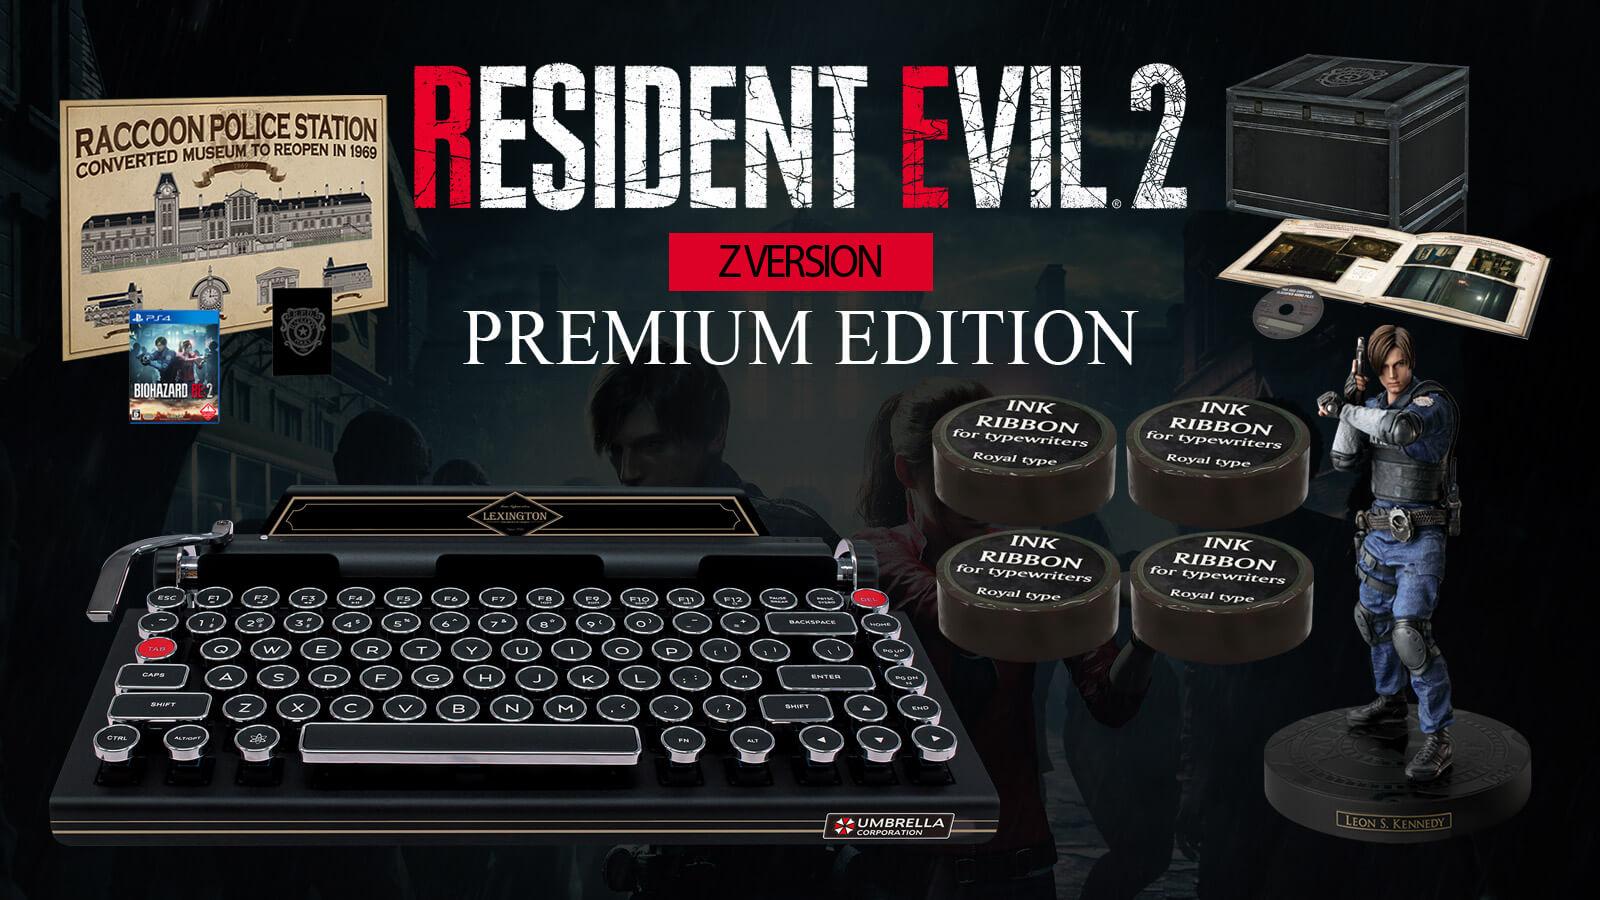 Resident Evil 2 Remake |OT| Party like it's 1998 | NeoGAF